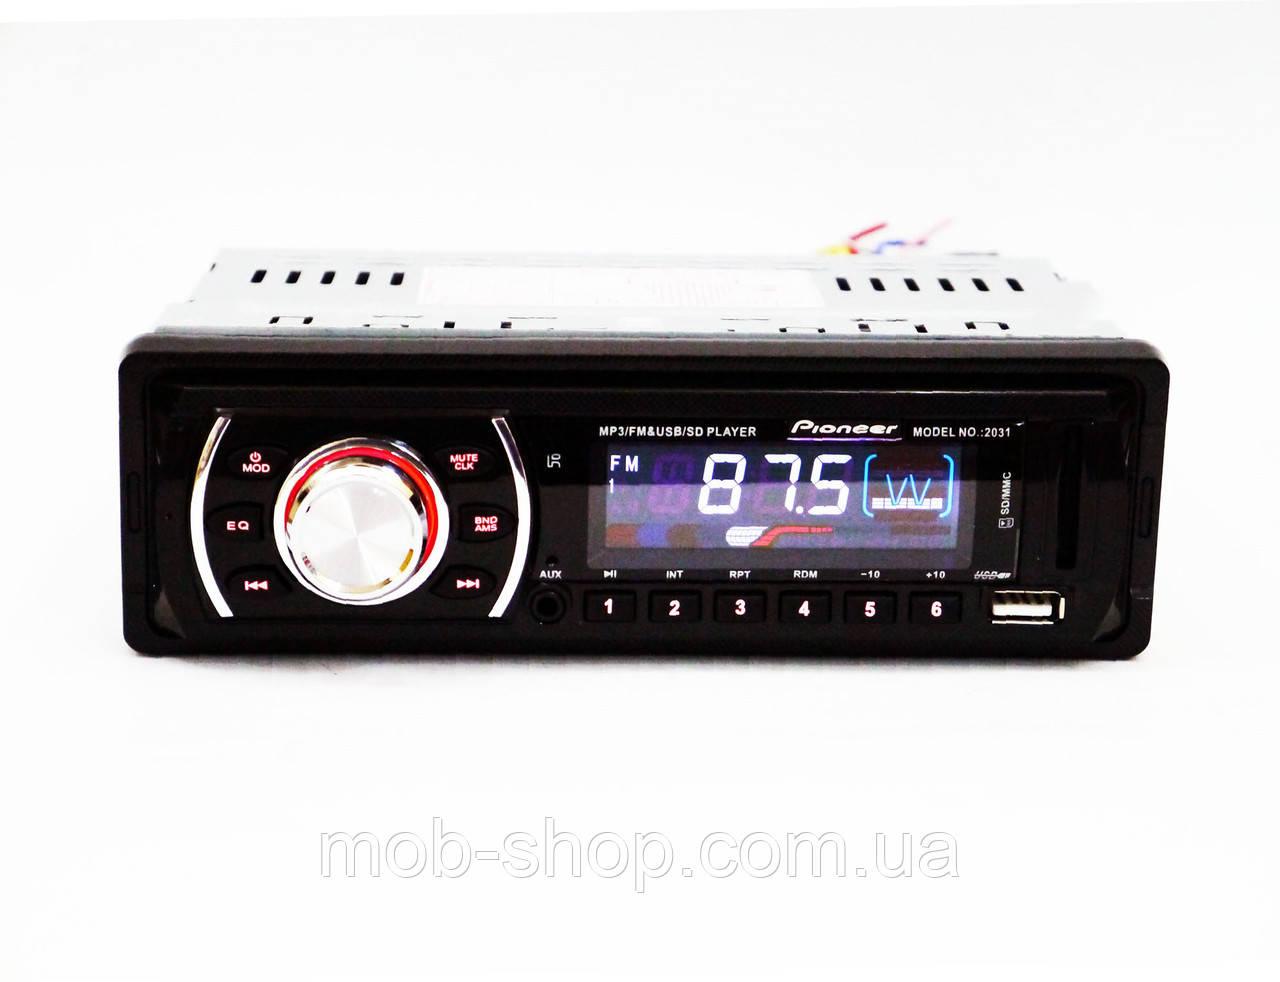 Автомагнитола пионер Pioneer 2031 MP3+Usb+Sd+Fm+Aux+пульт (4x50W)